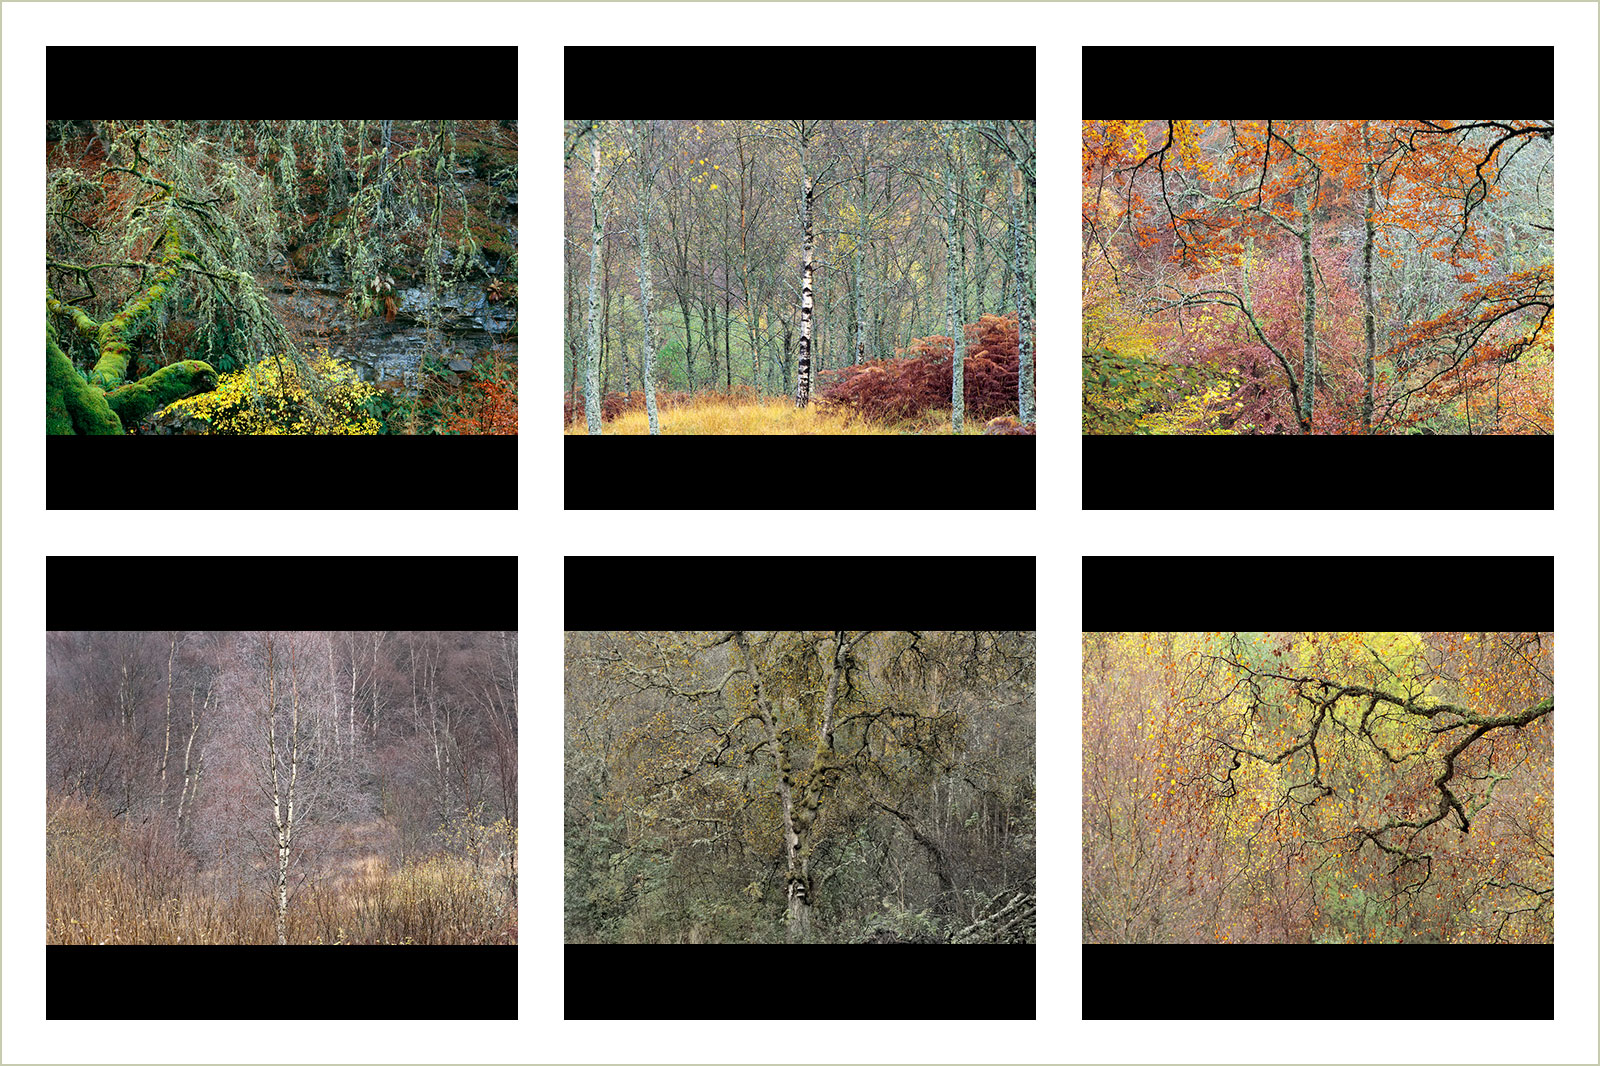 Beech and Birch, © Stephen Whitehorne, Winner in category Portfolio, RHS Photographic Competition / RHS Gardening